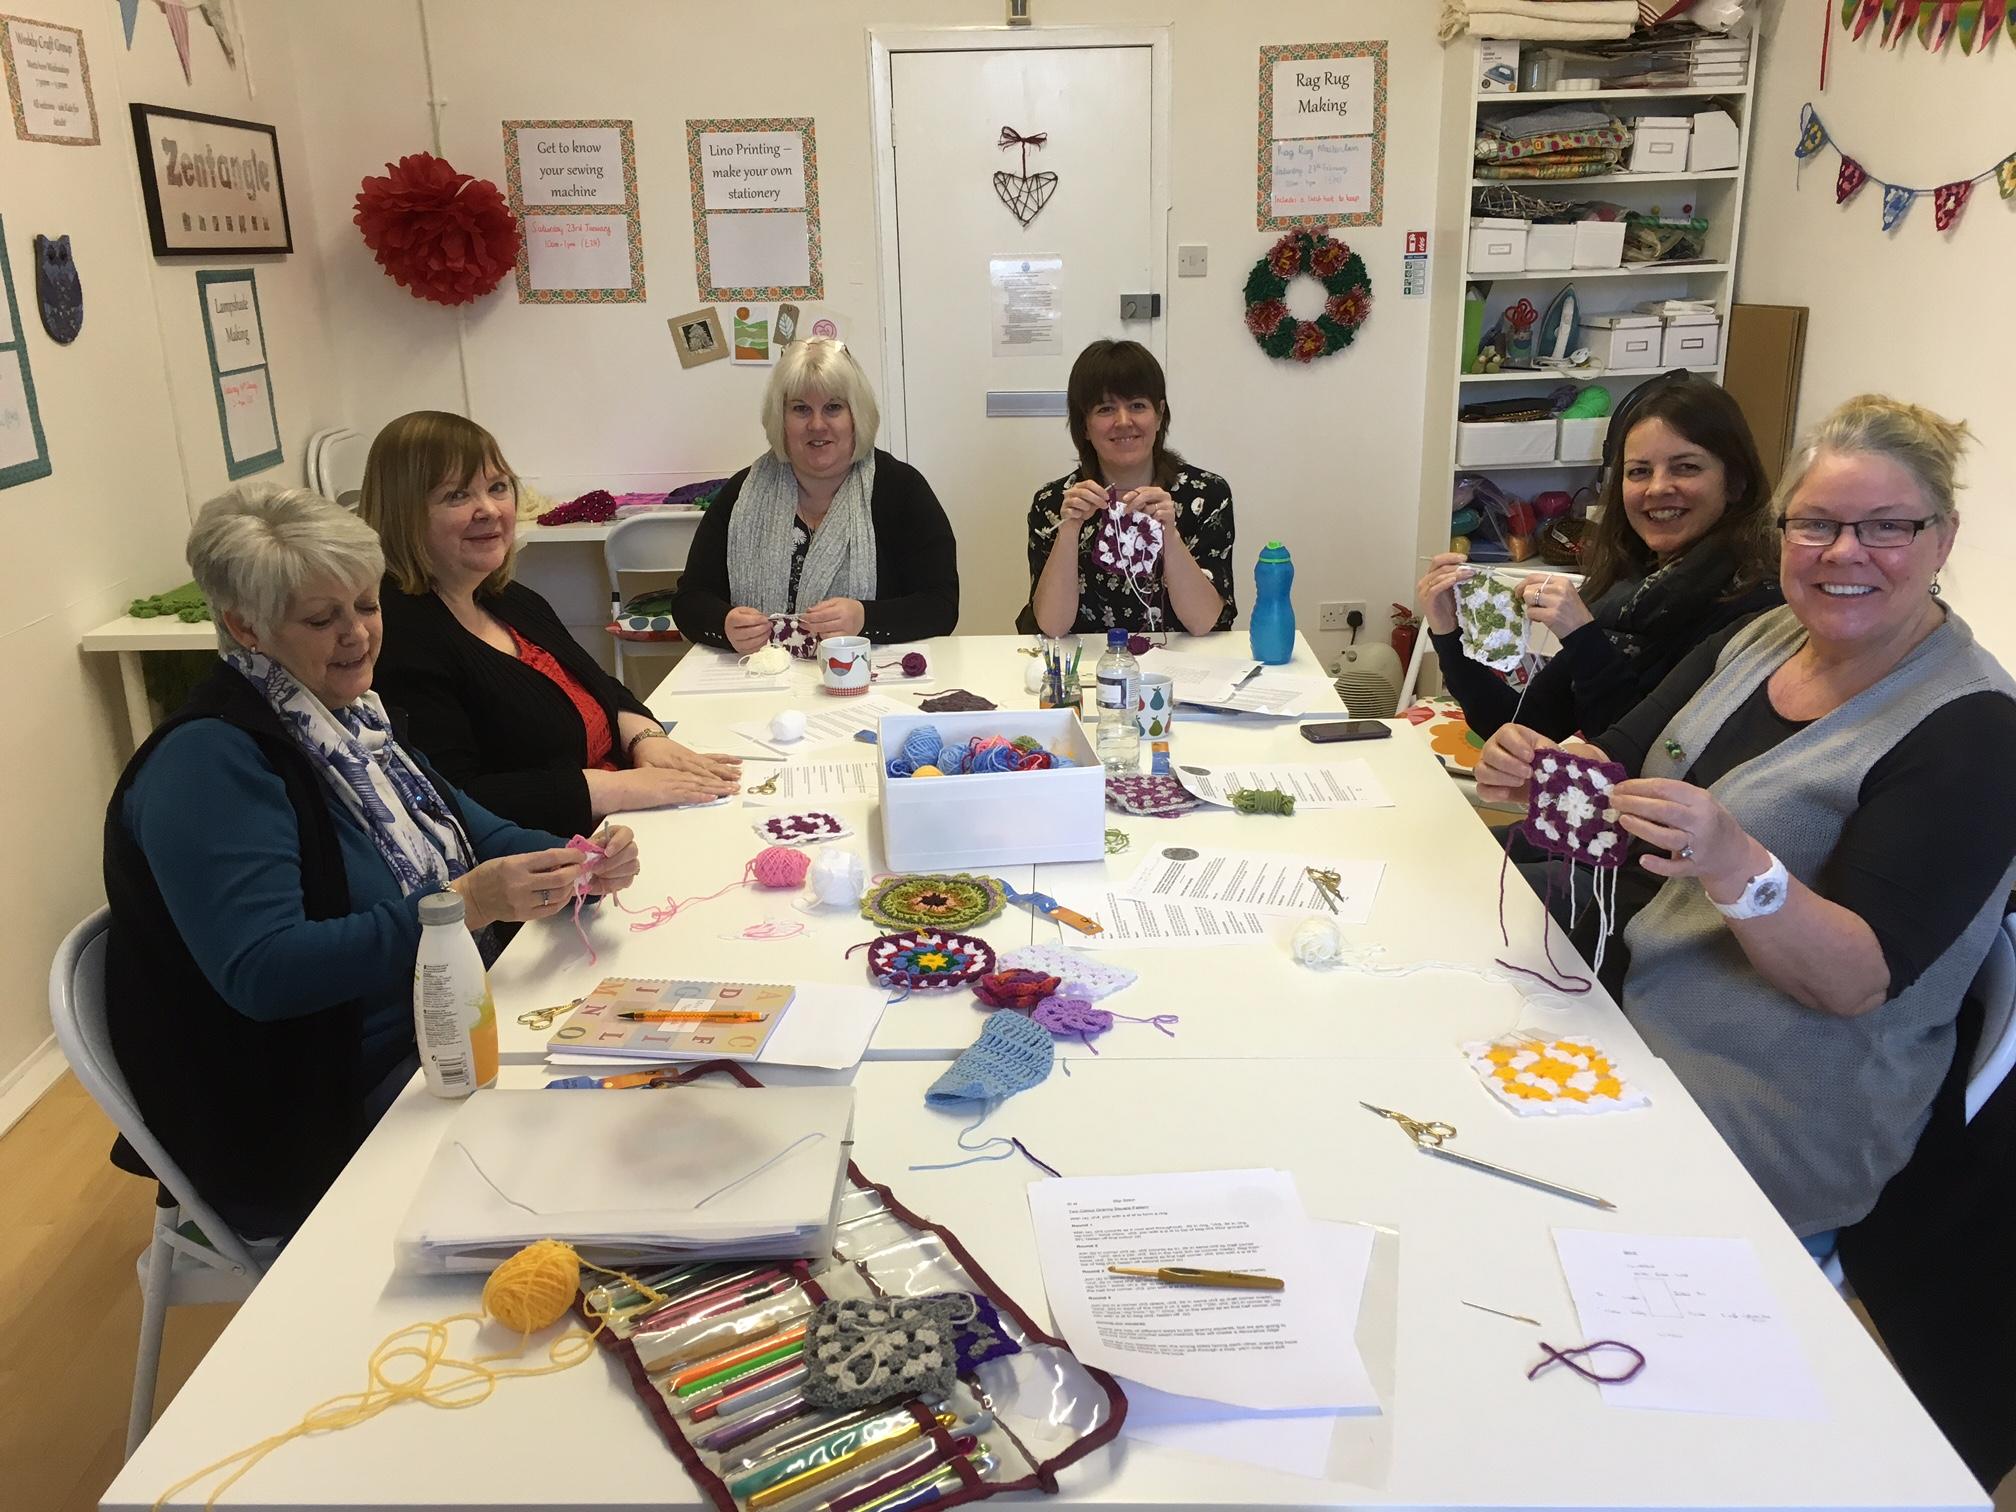 The granny square beginner crochet workshop in action!